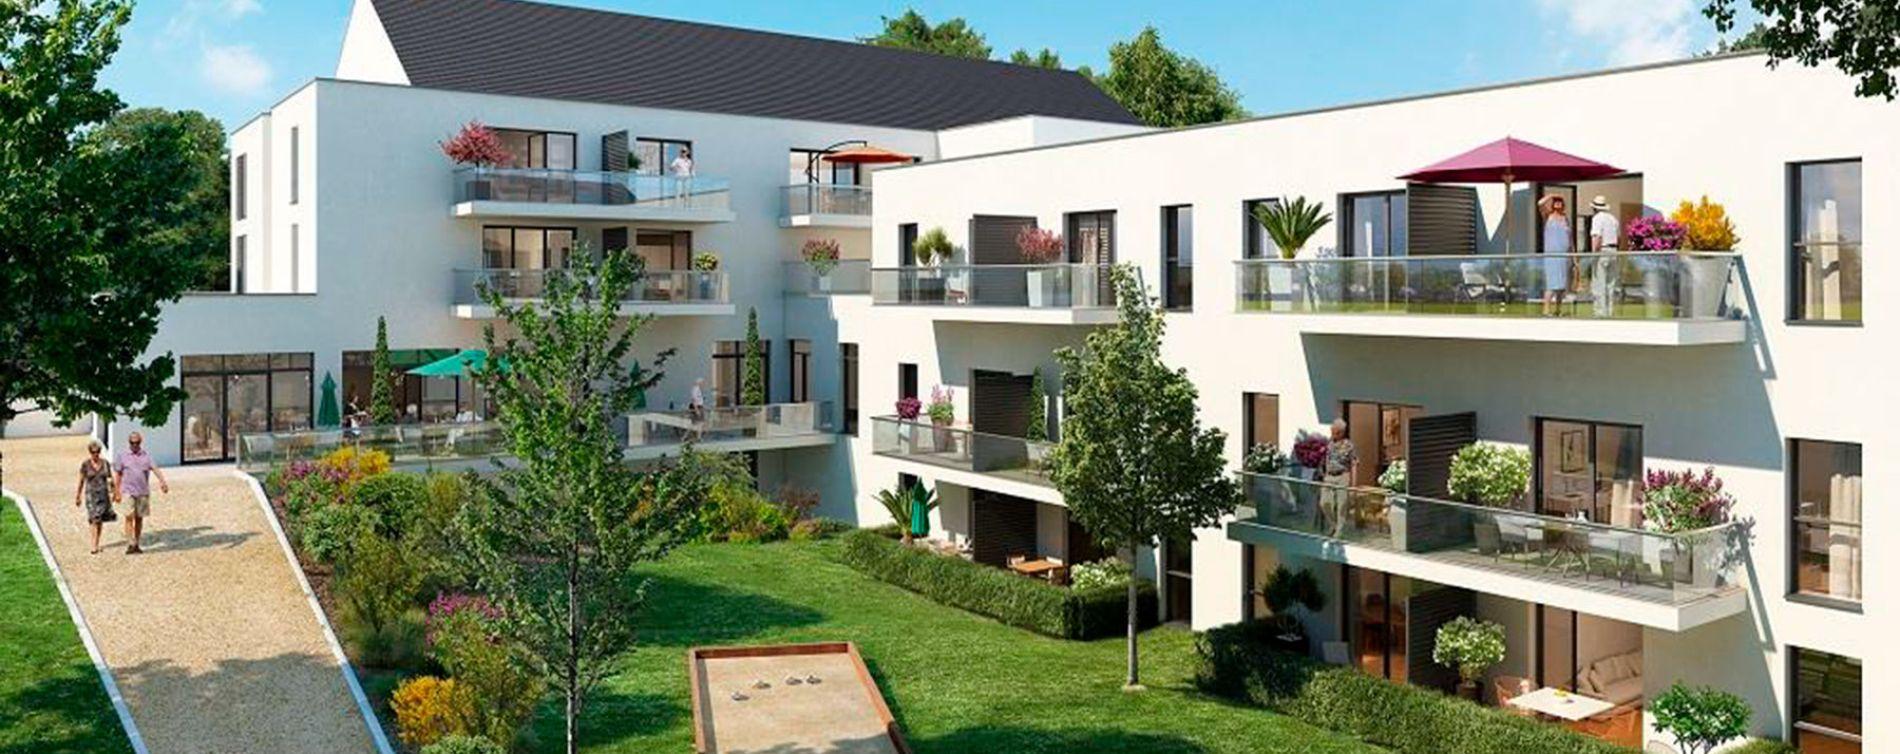 La Roche-Bernard : programme immobilier neuve « Jardin Valentin » (2)